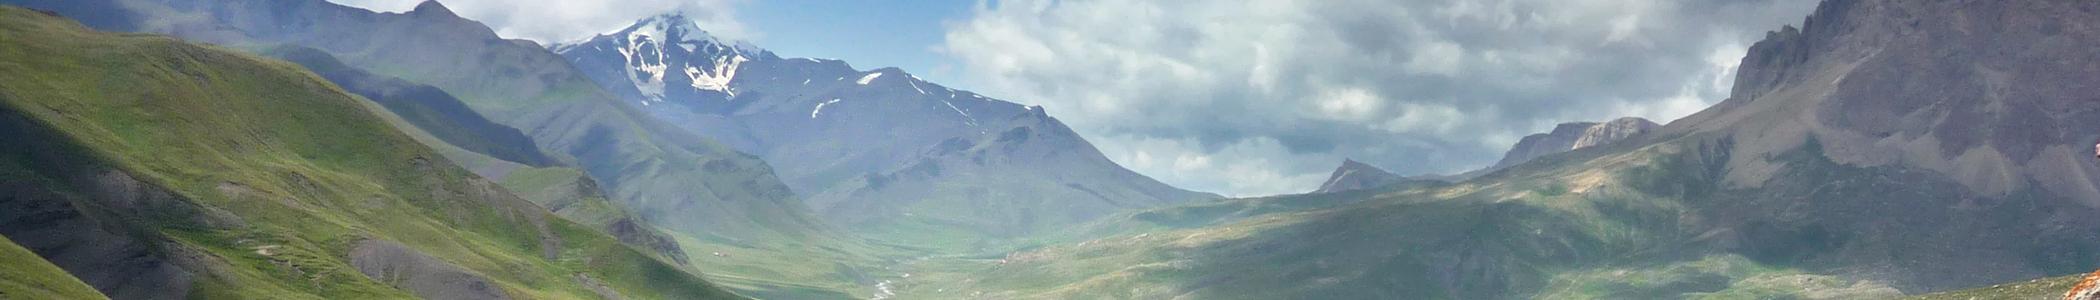 Iranian Azerbaijanis  Wikipedia